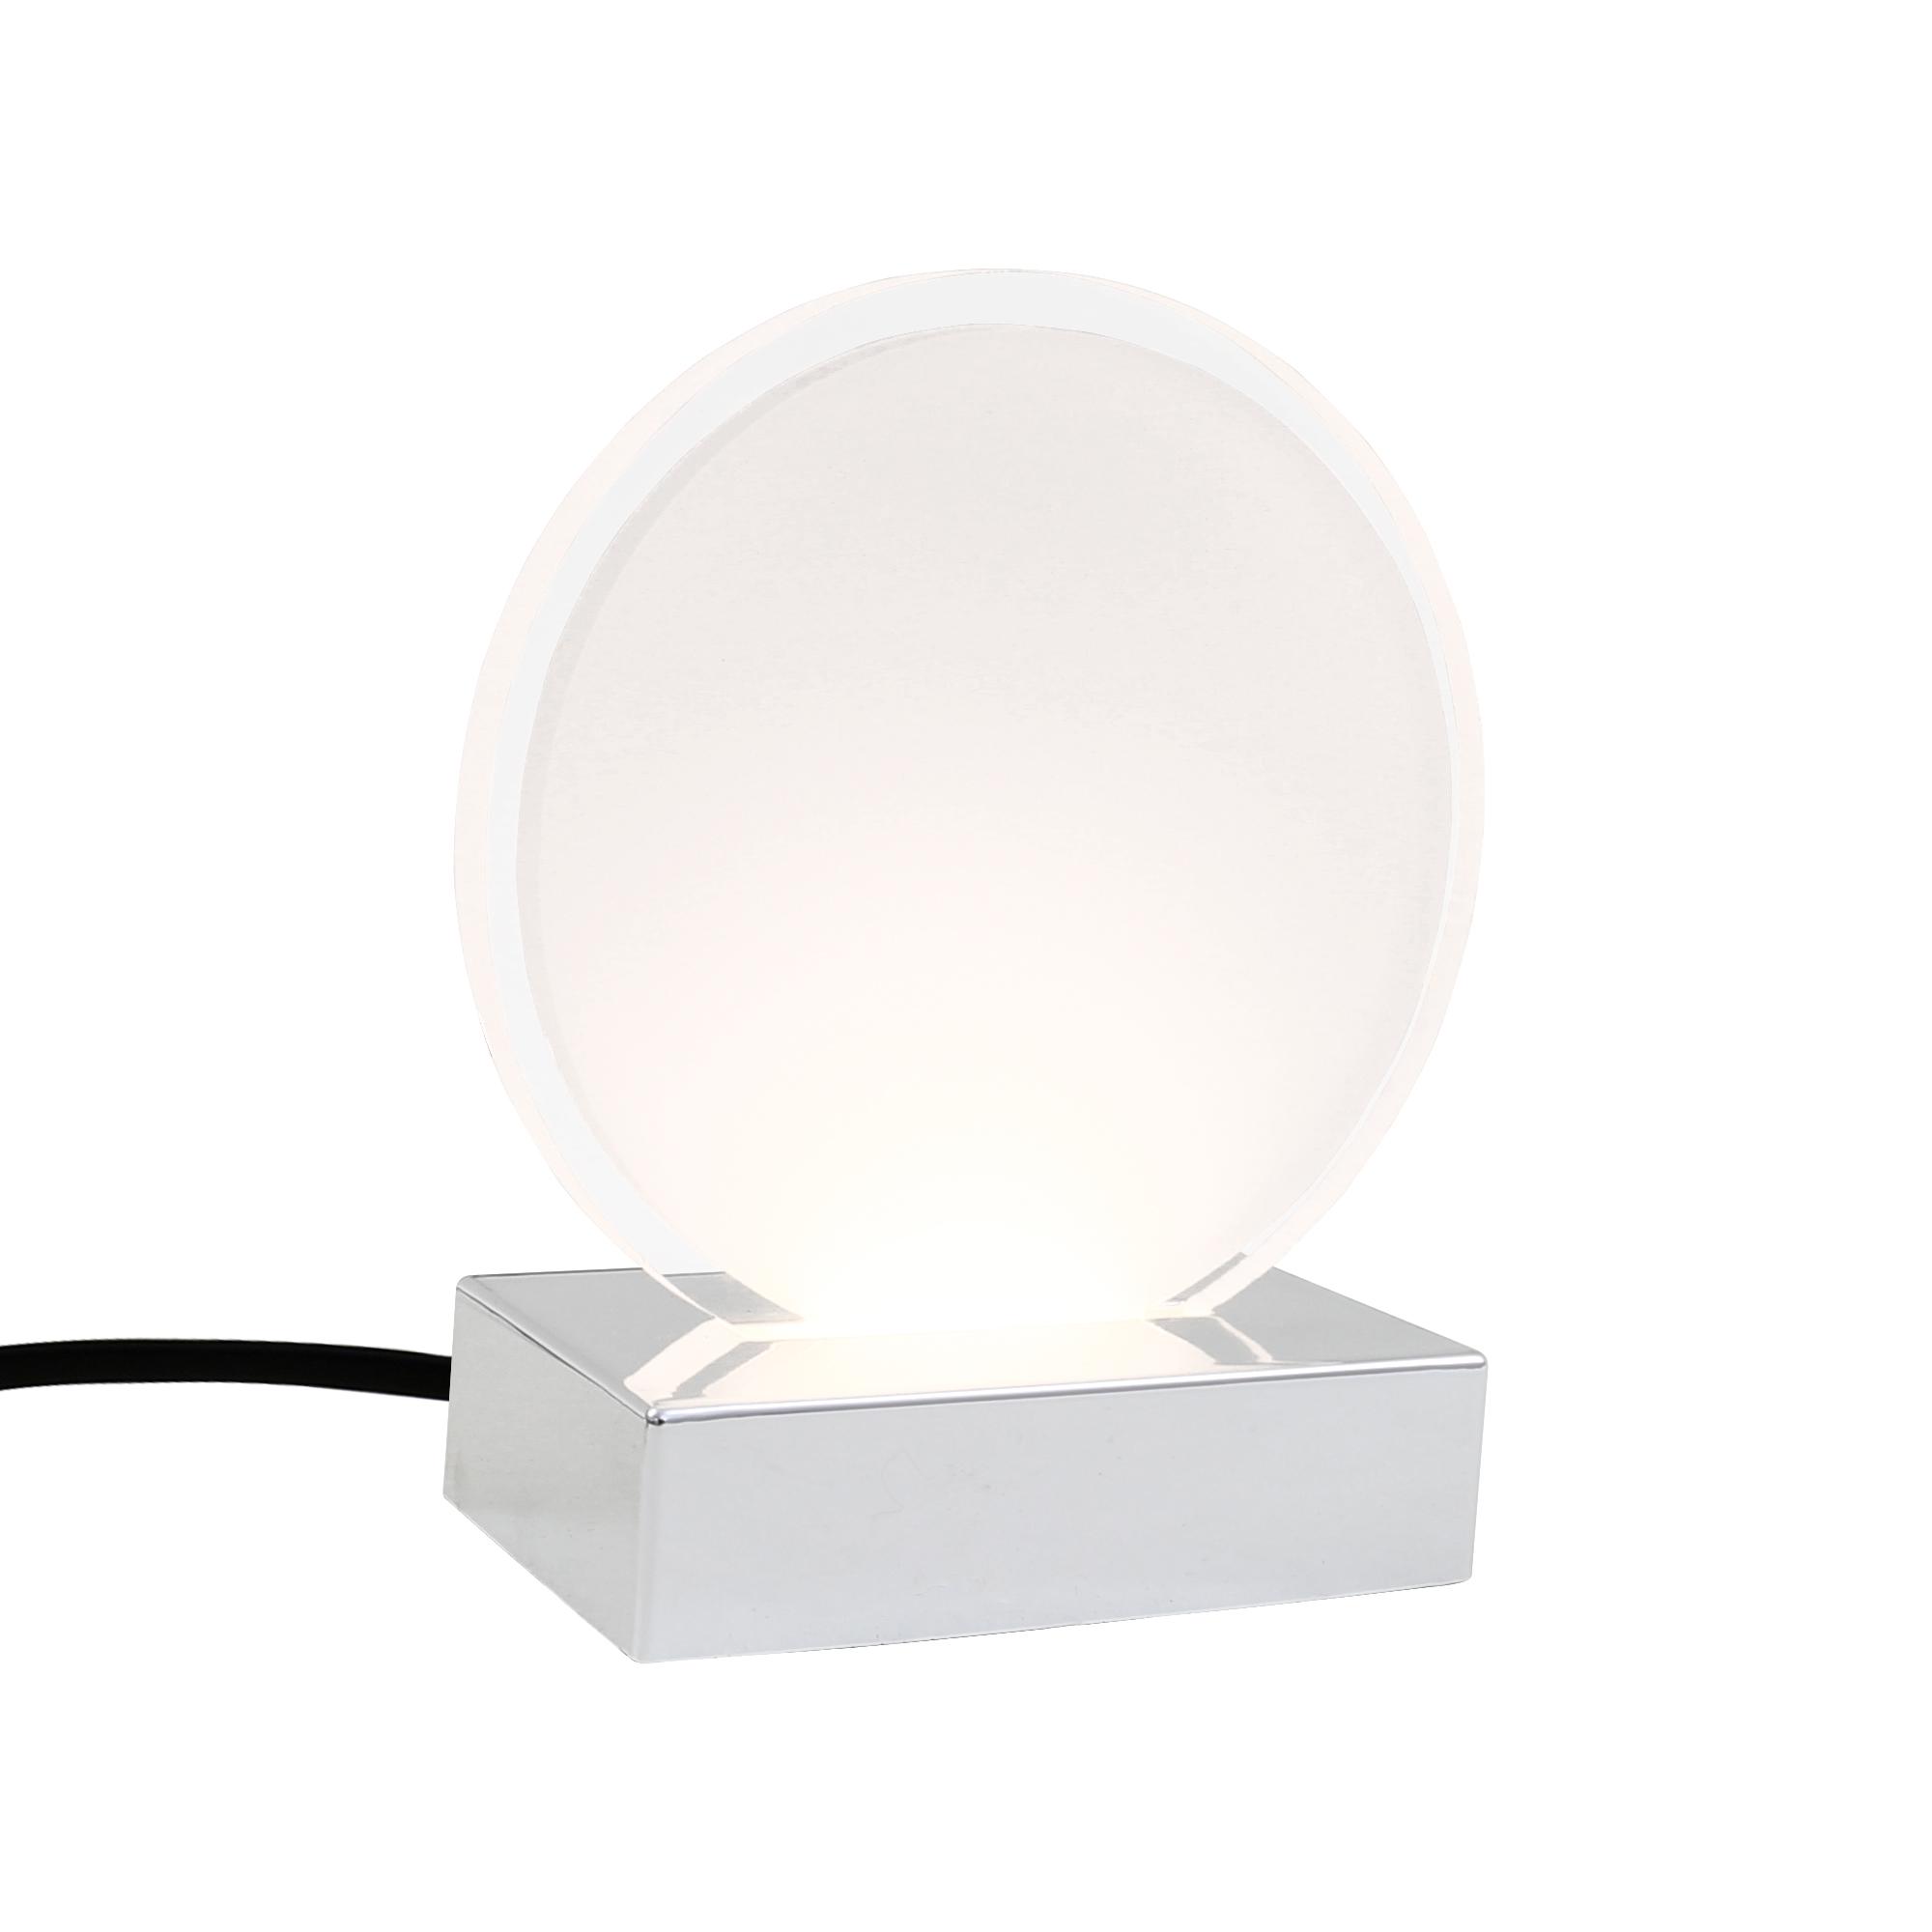 LED Tischleuchte, 14 cm, 3 W, Chrom